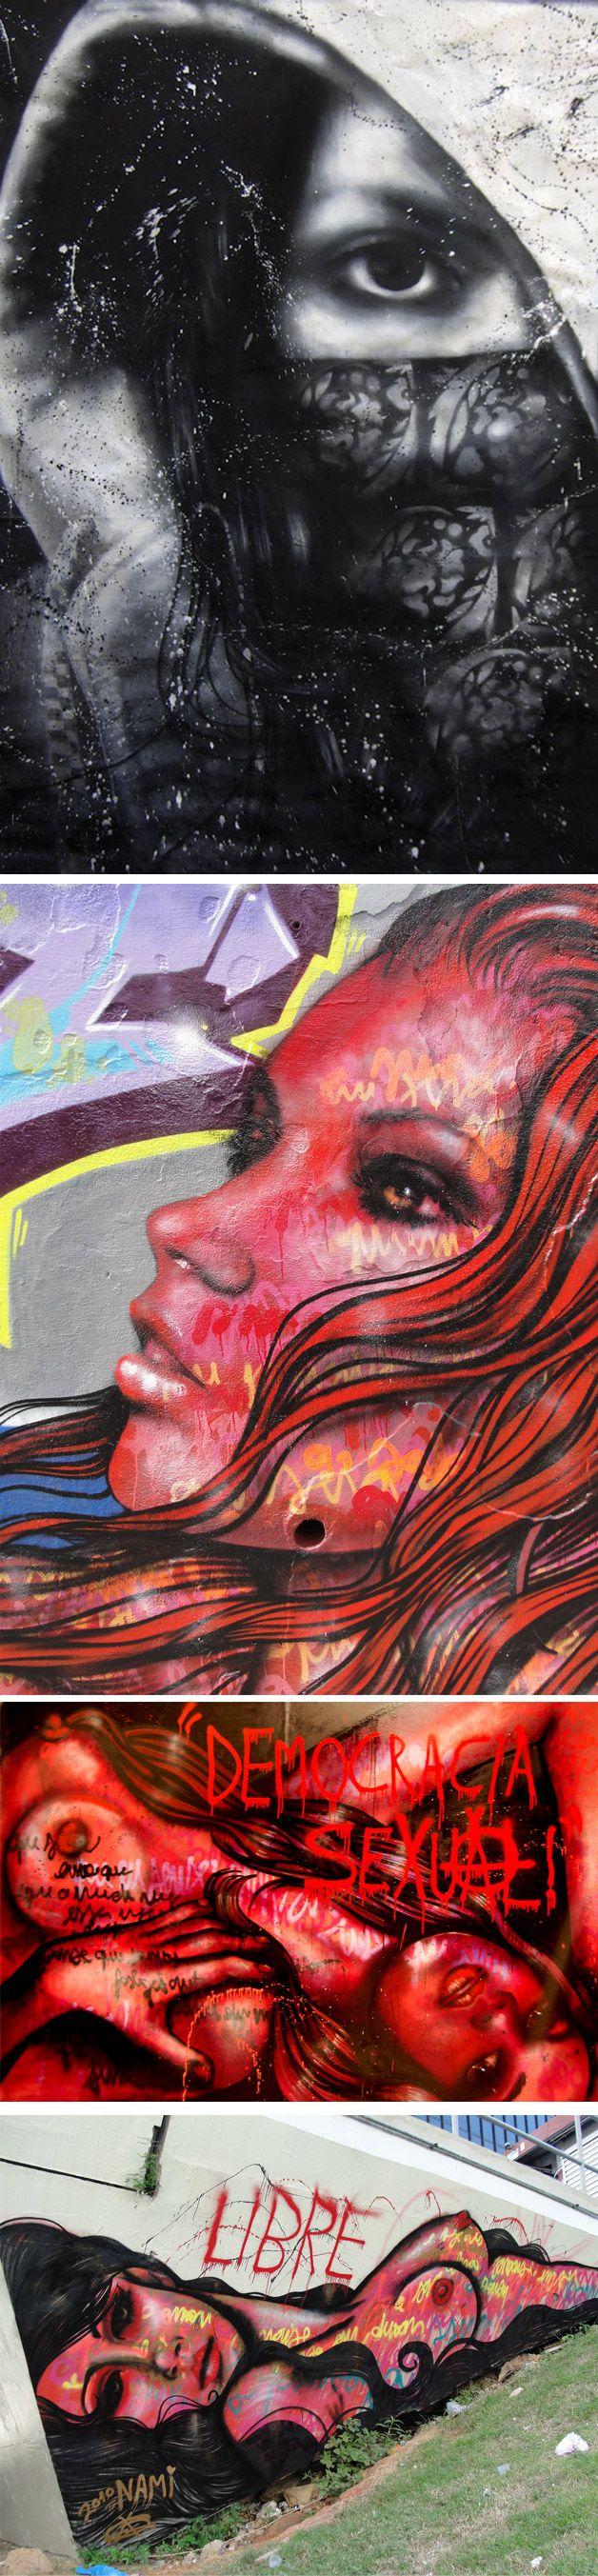 Grafitte by Panmela Castro - Anarkia